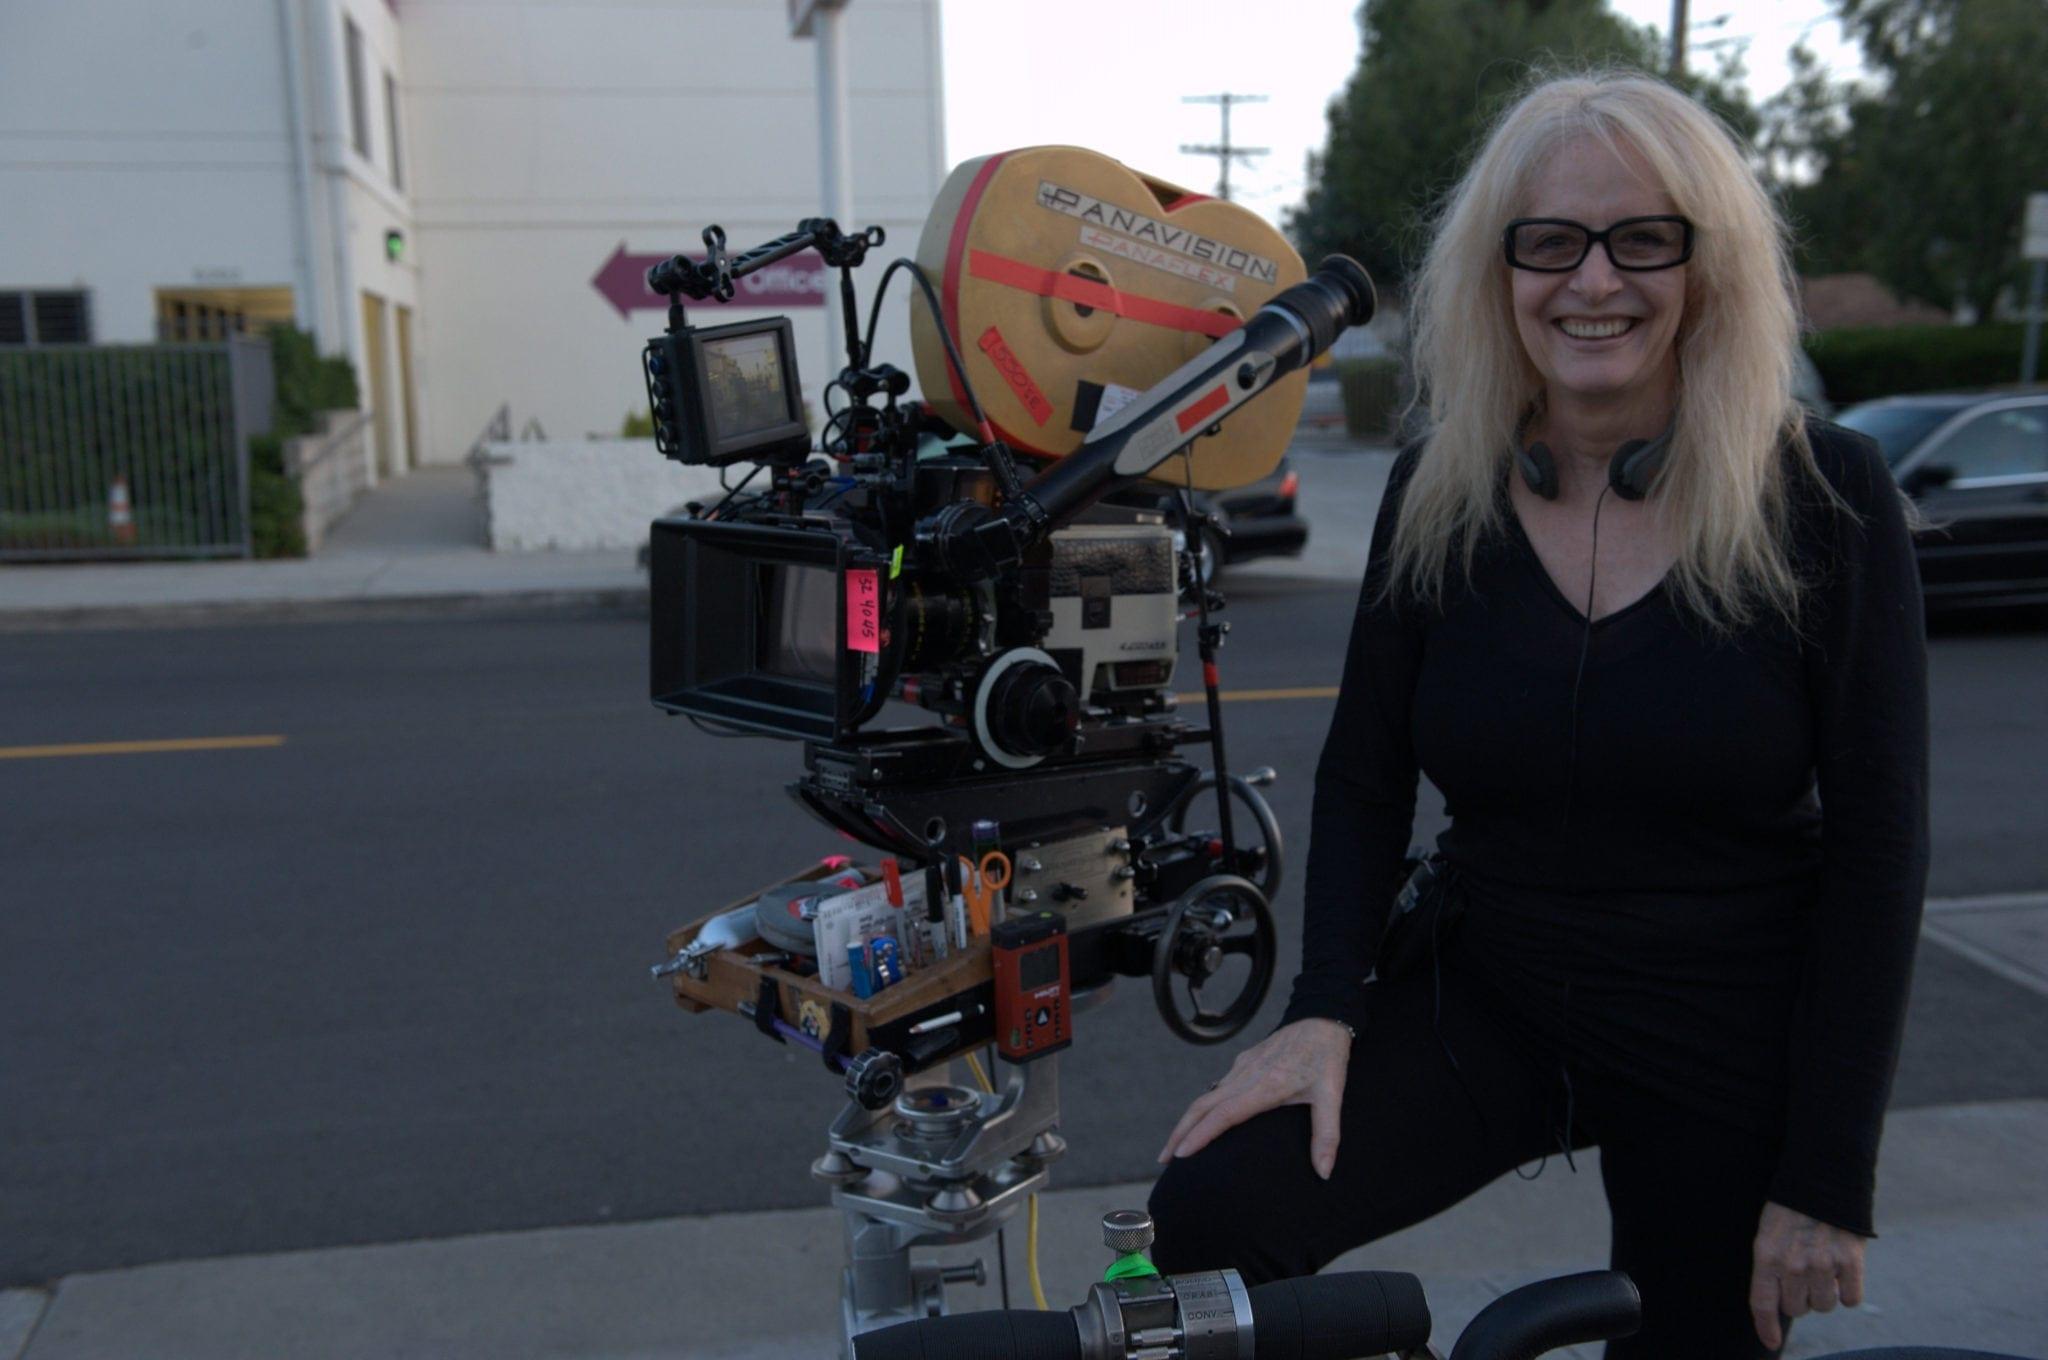 Director Penelope Spheeris directed three Decline documentaries on the L.A. music scene.